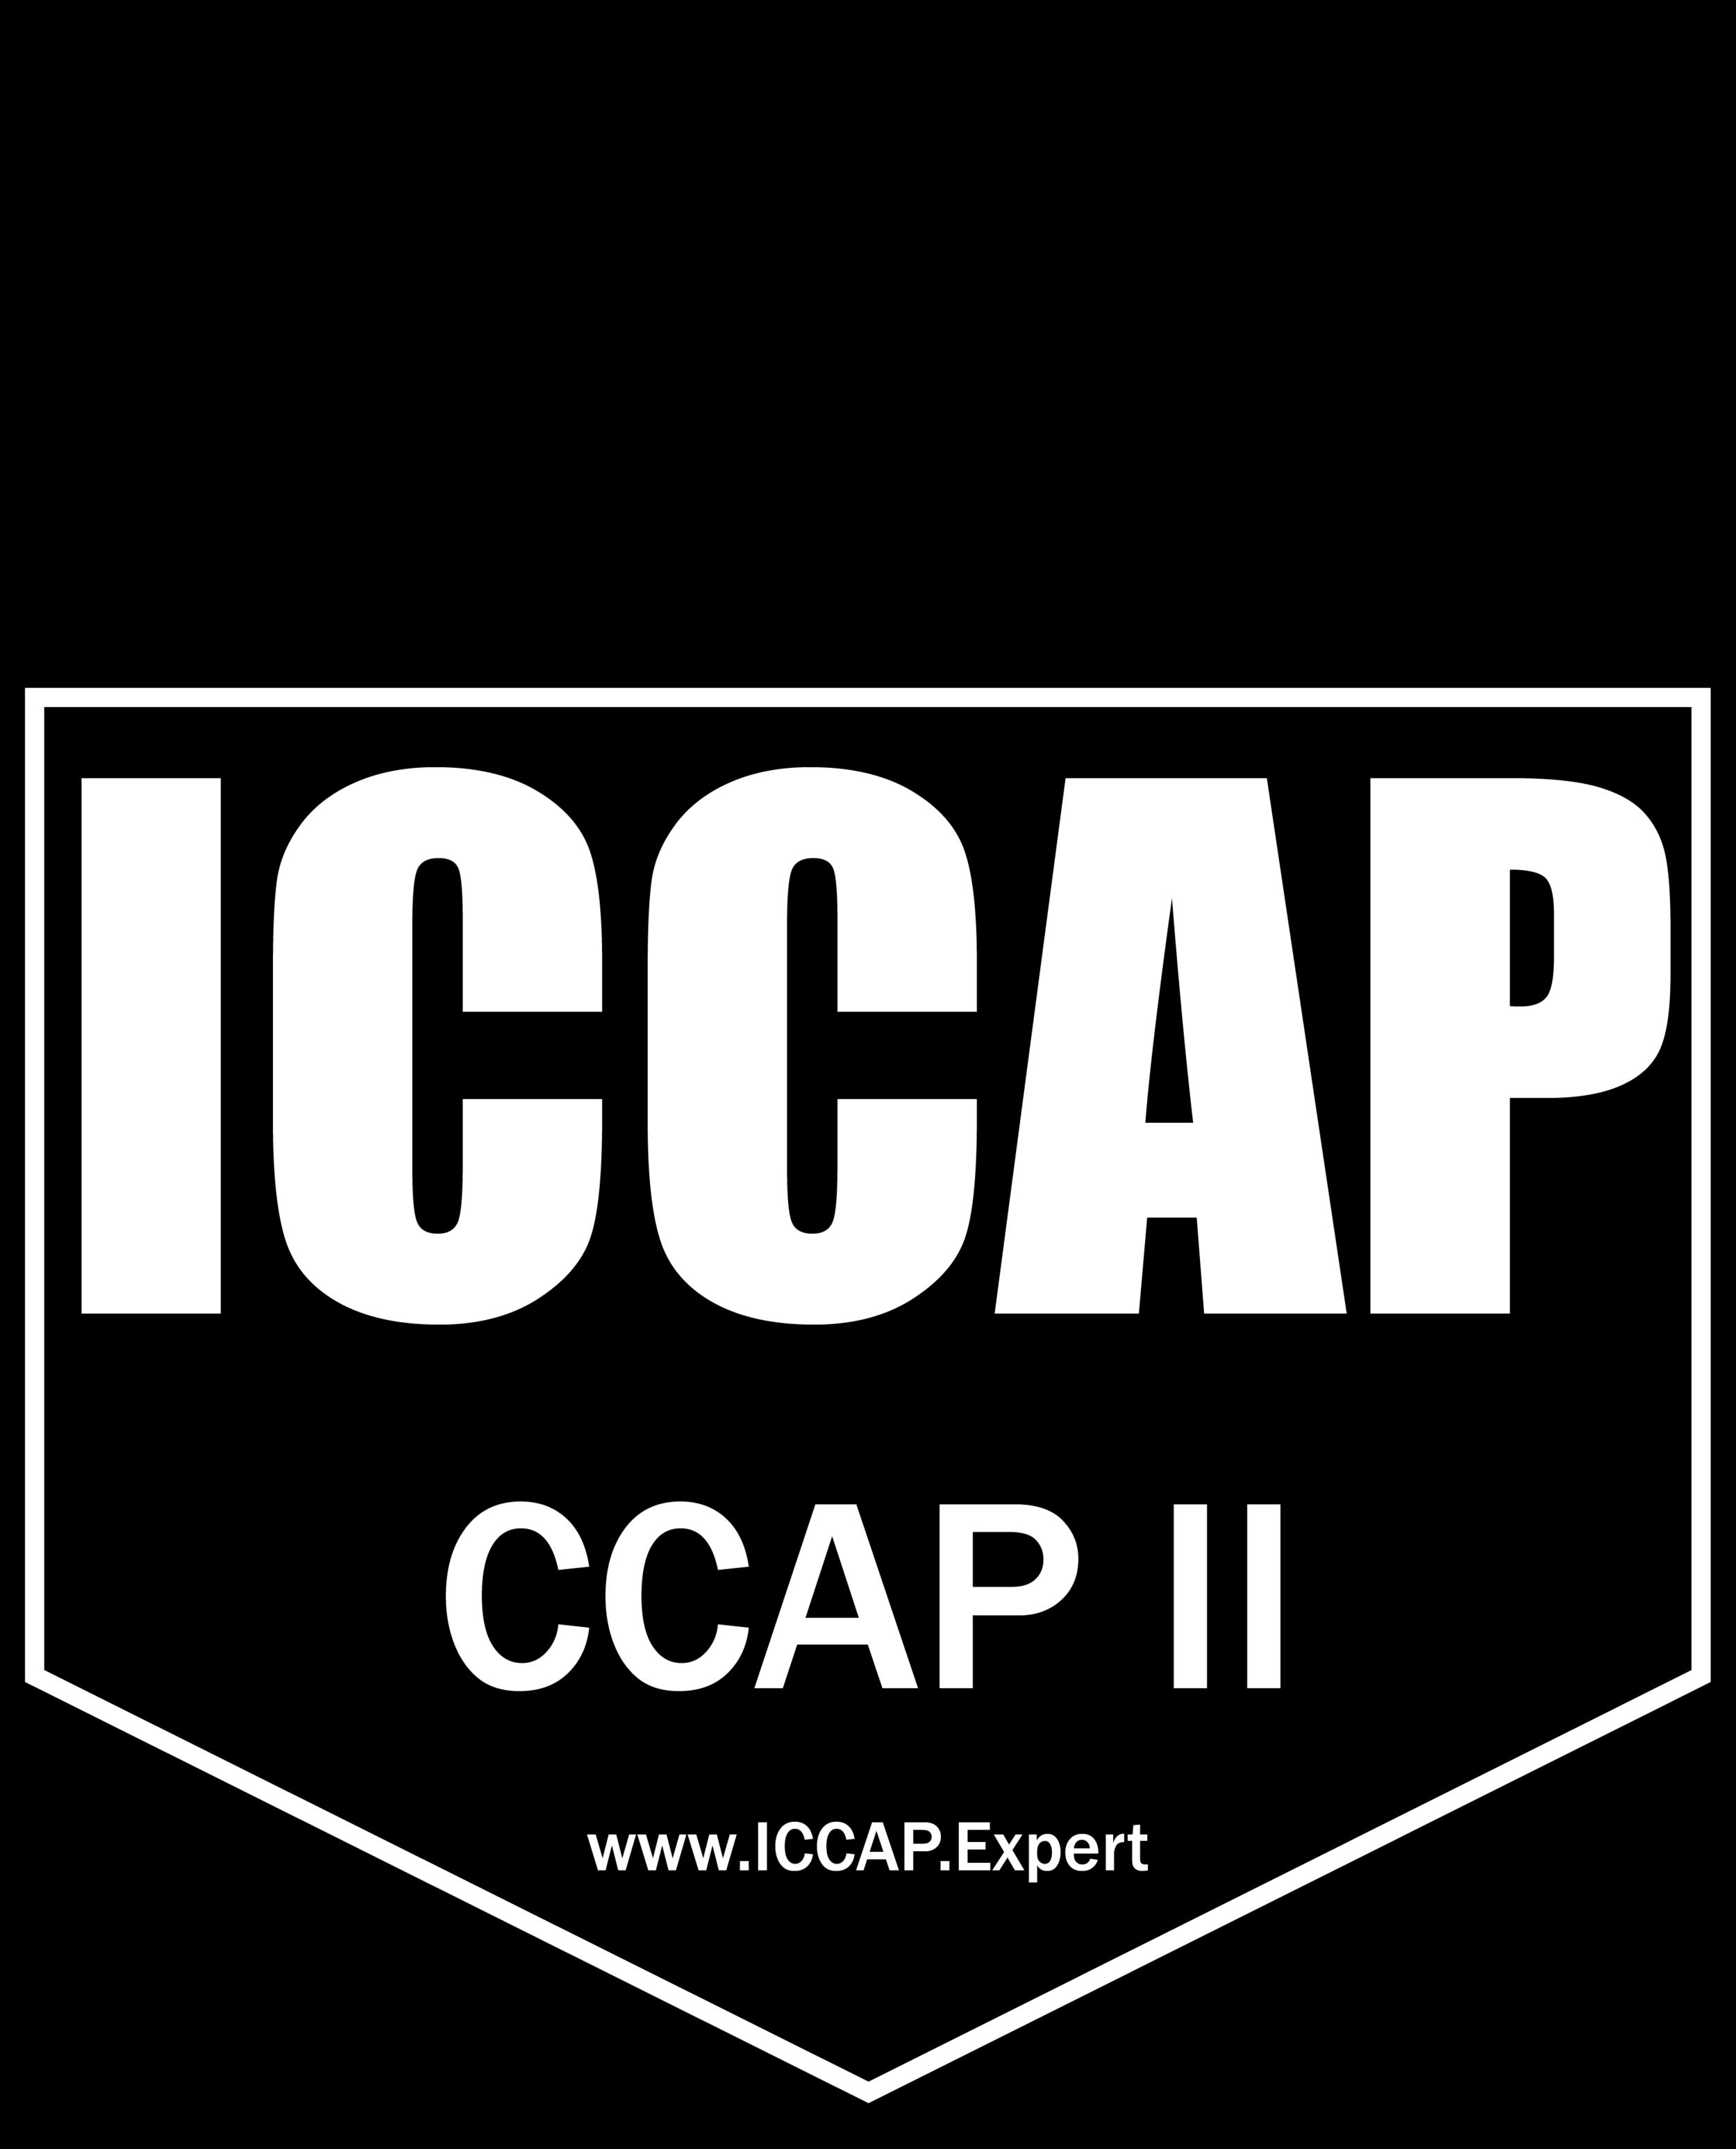 iccap-ccap-II-advocacy-marketing-certification.png